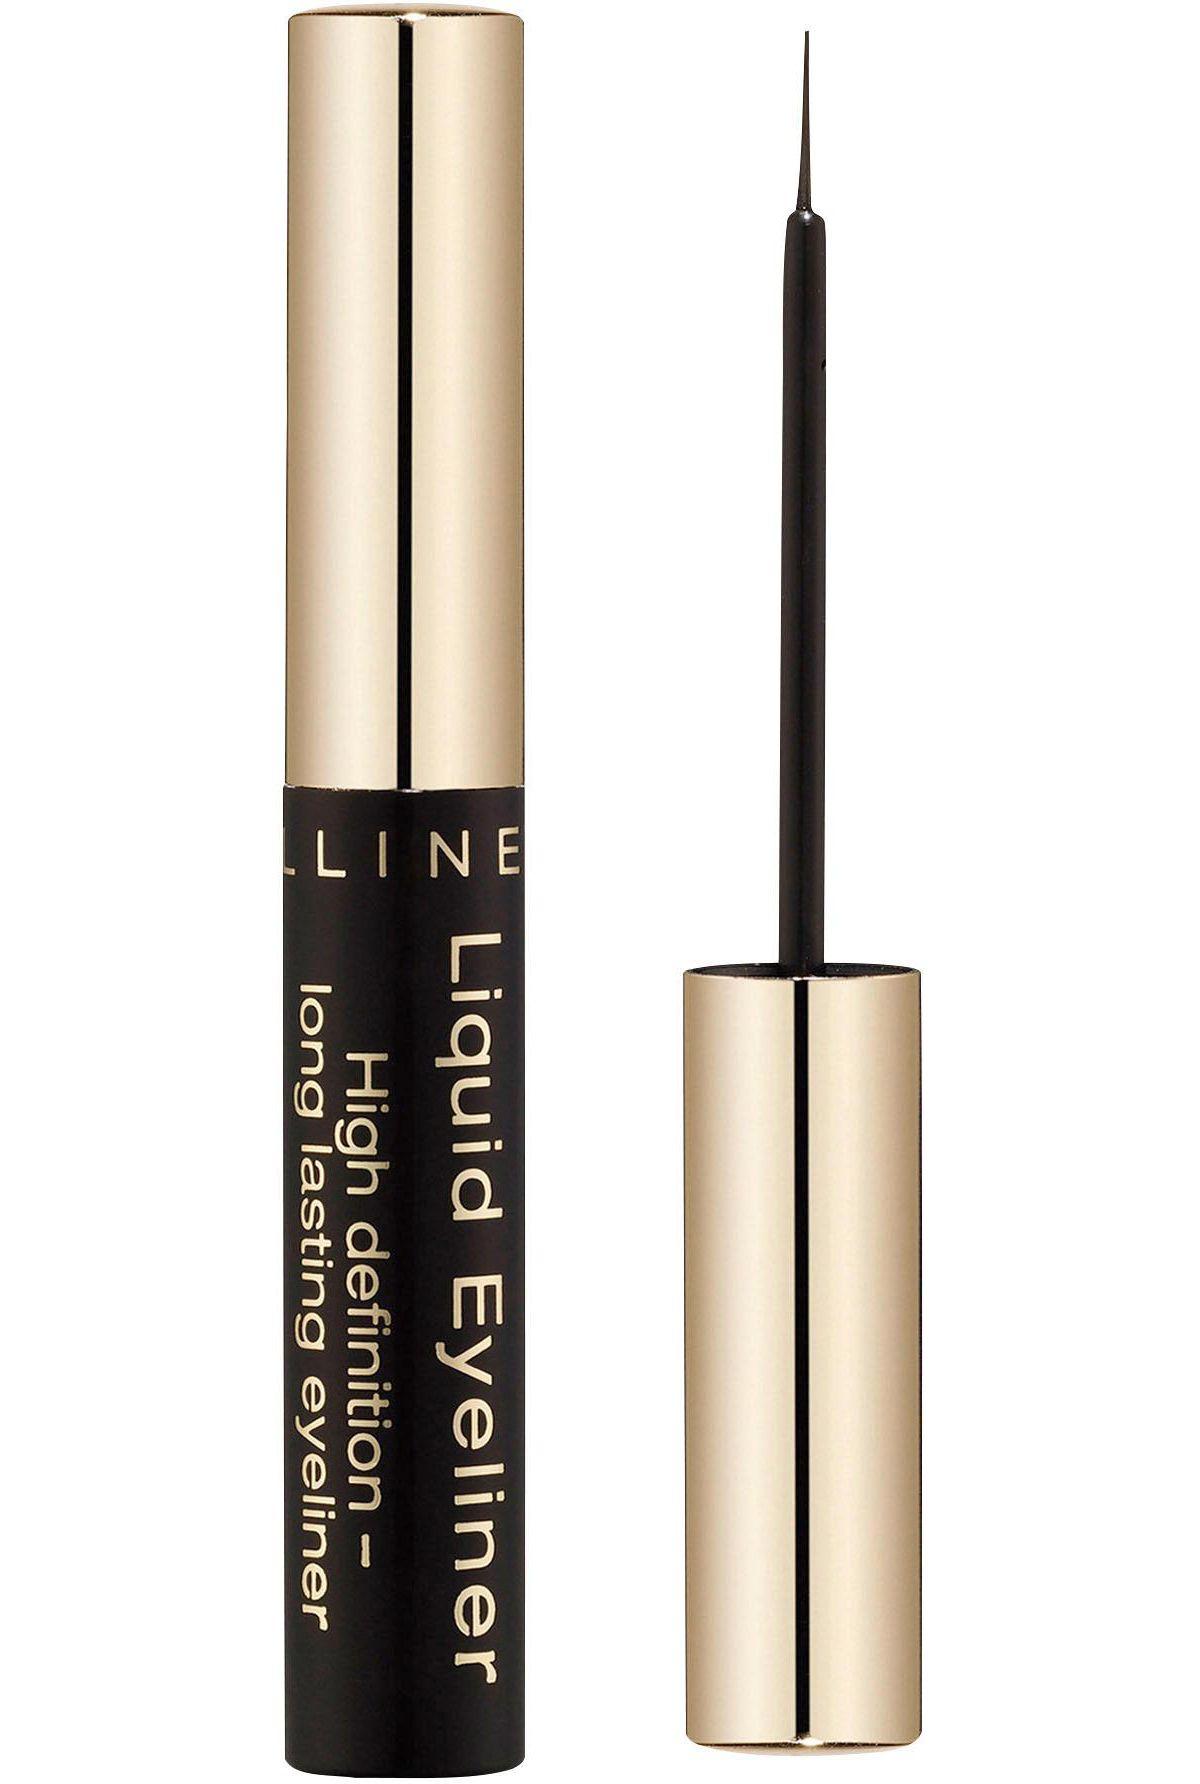 Maybelline New York, »Liquid Eye Liner«, Eyeliner